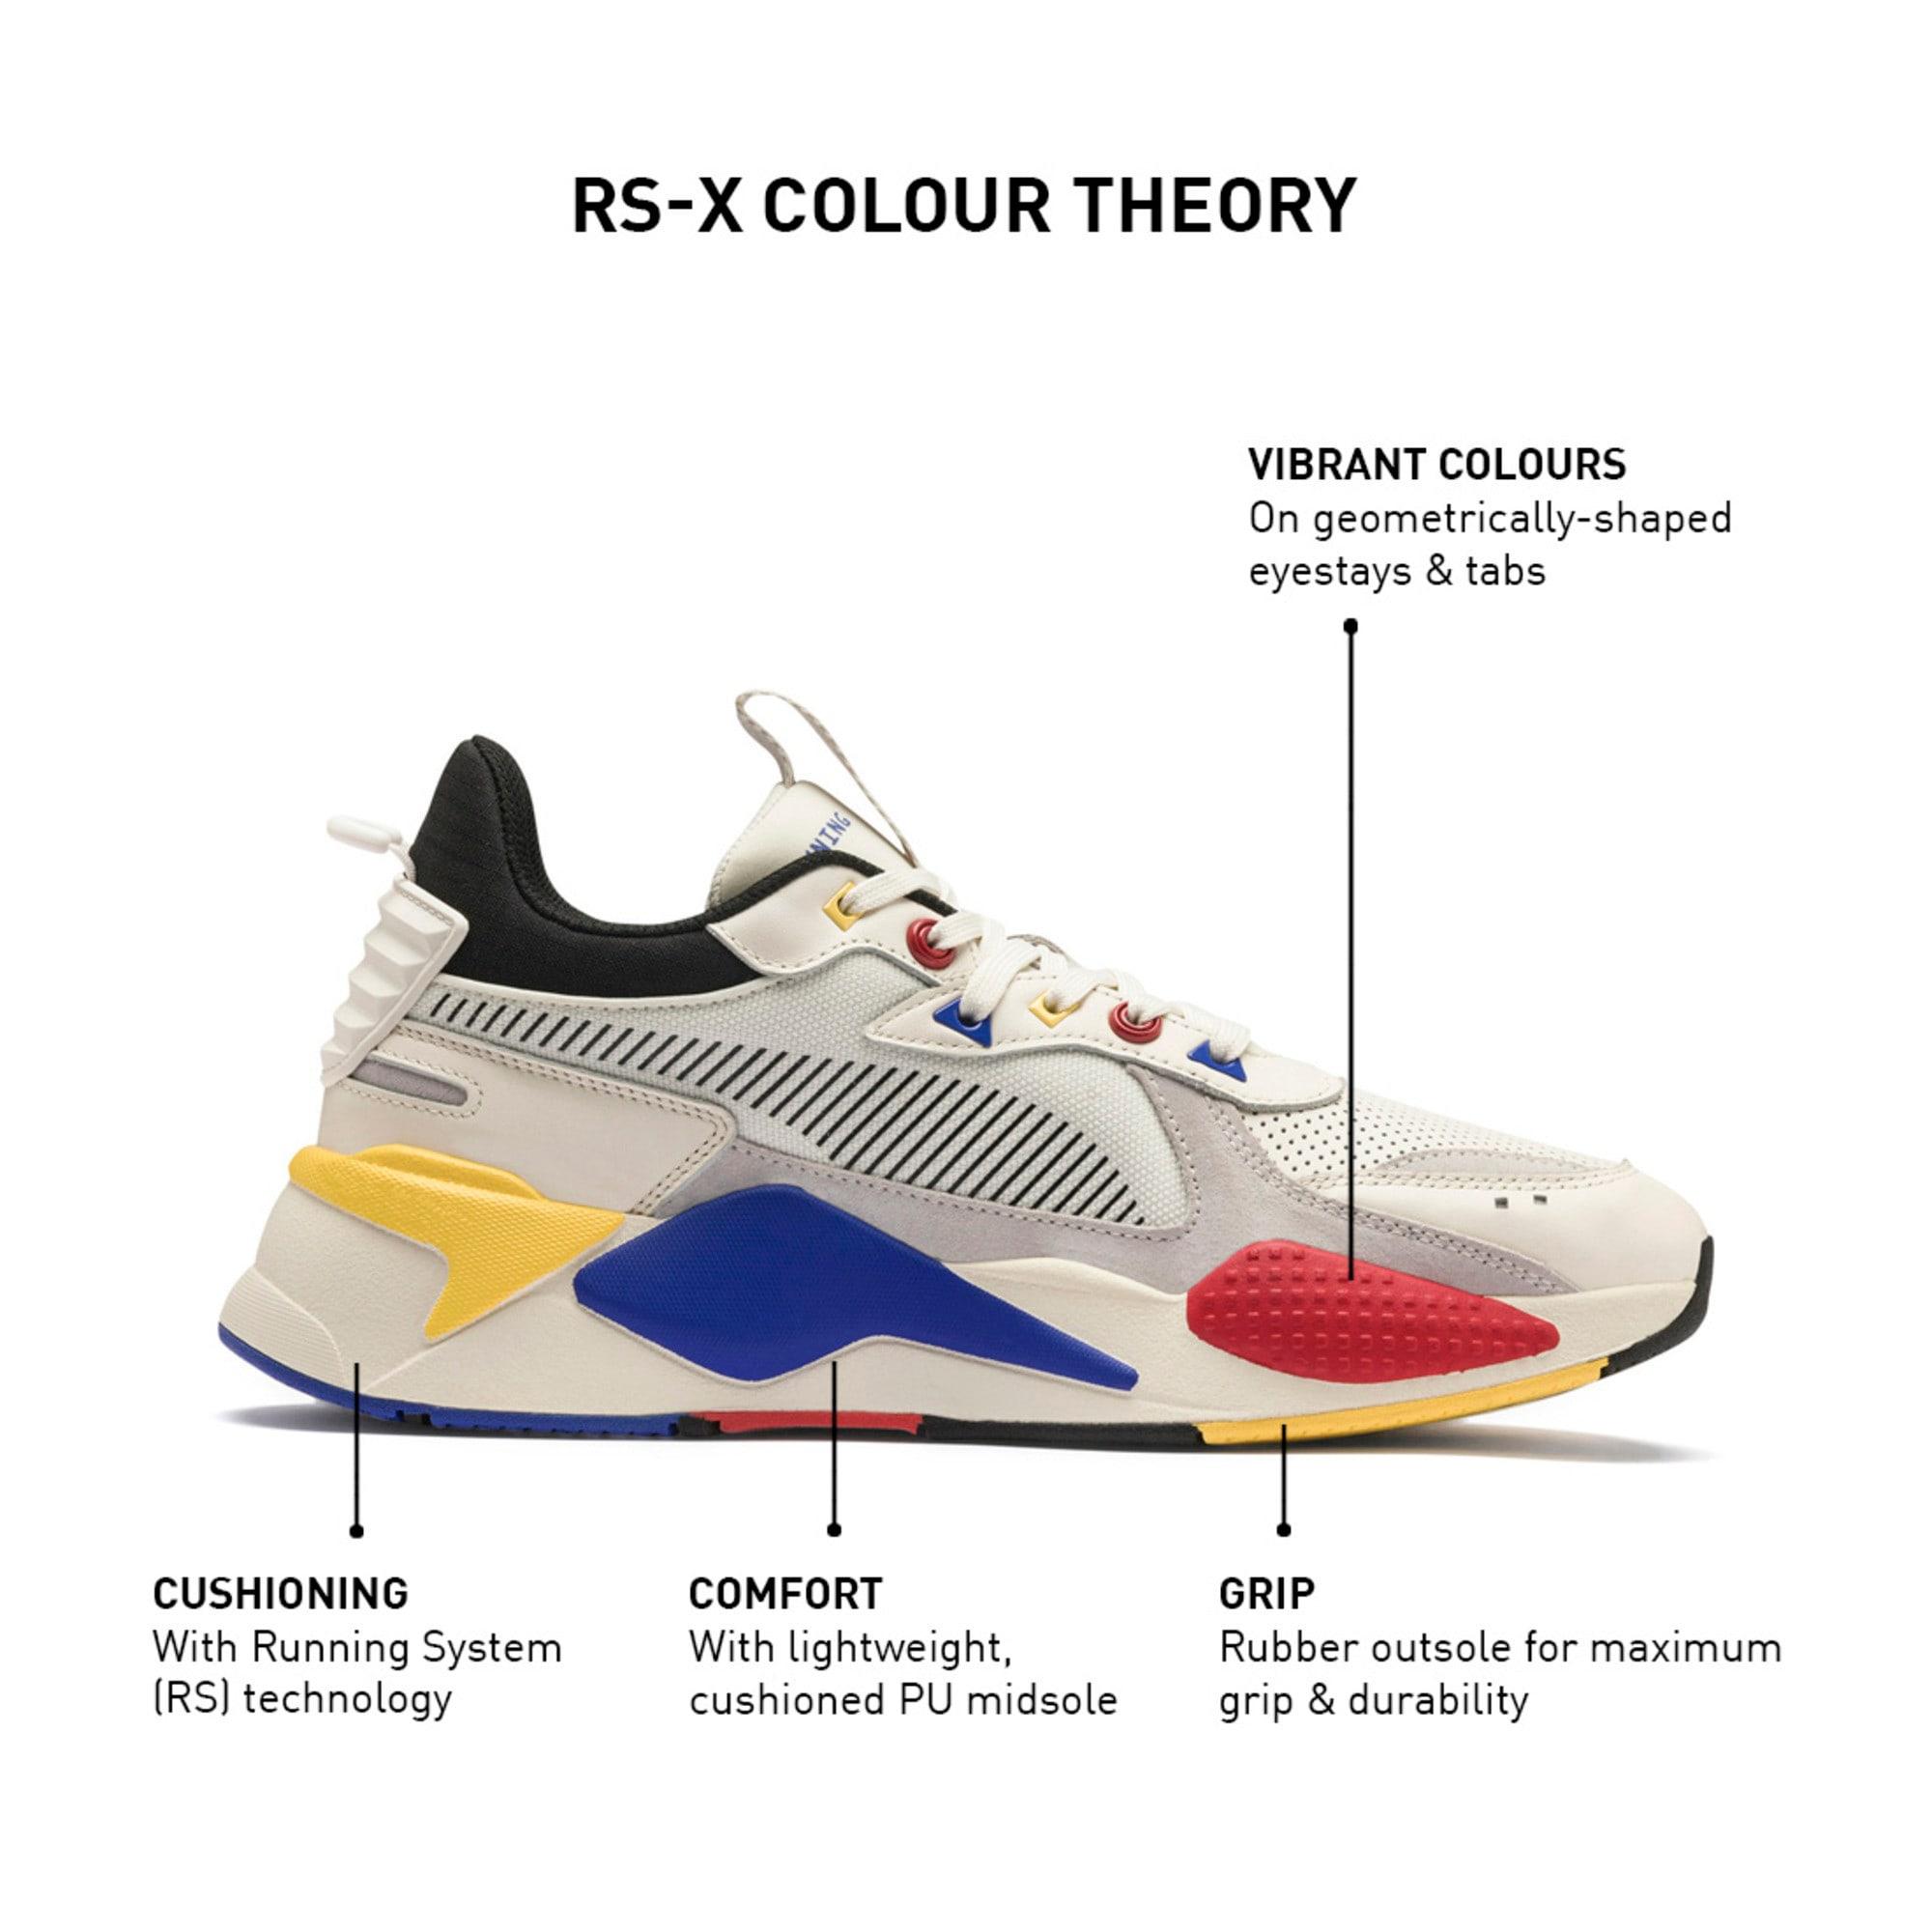 Thumbnail 9 of RS-X Colour Theory Trainers, Whisper White-Puma Black, medium-IND